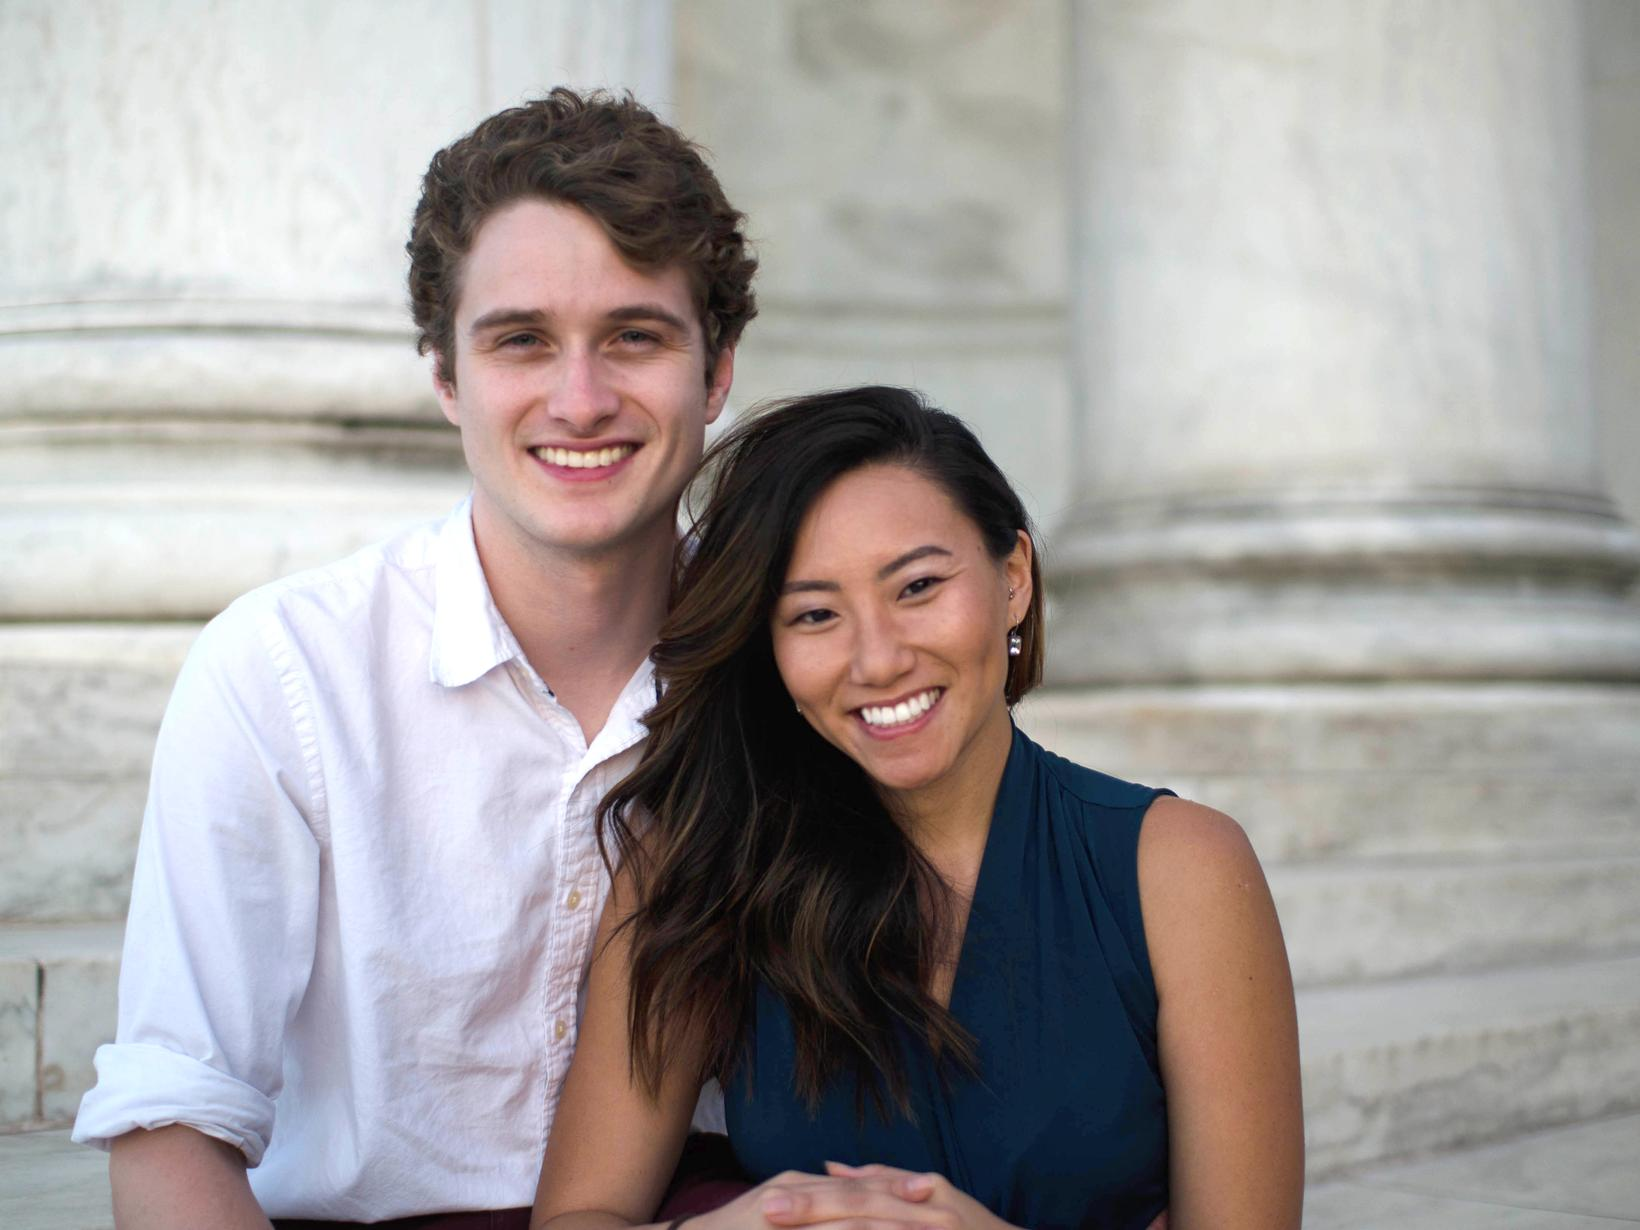 Erin & Brian from Washington, D.C., Washington, D.C., United States